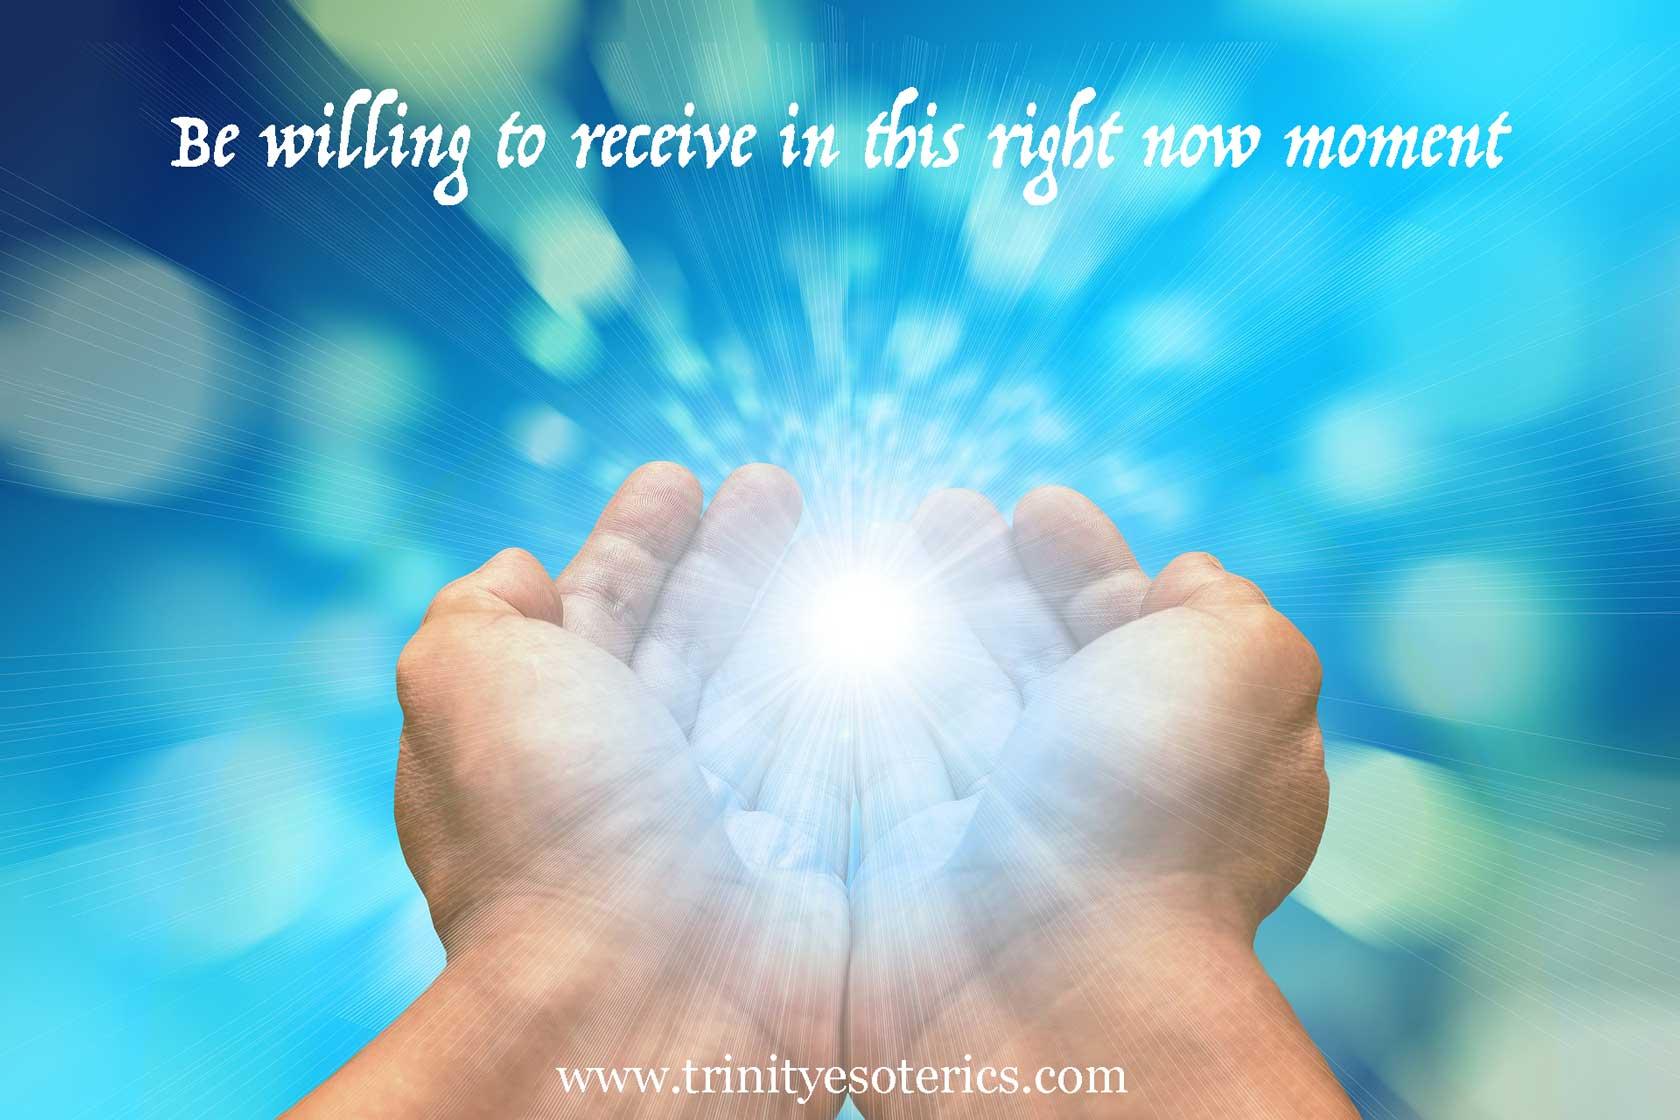 hands receiving trinity esoterics